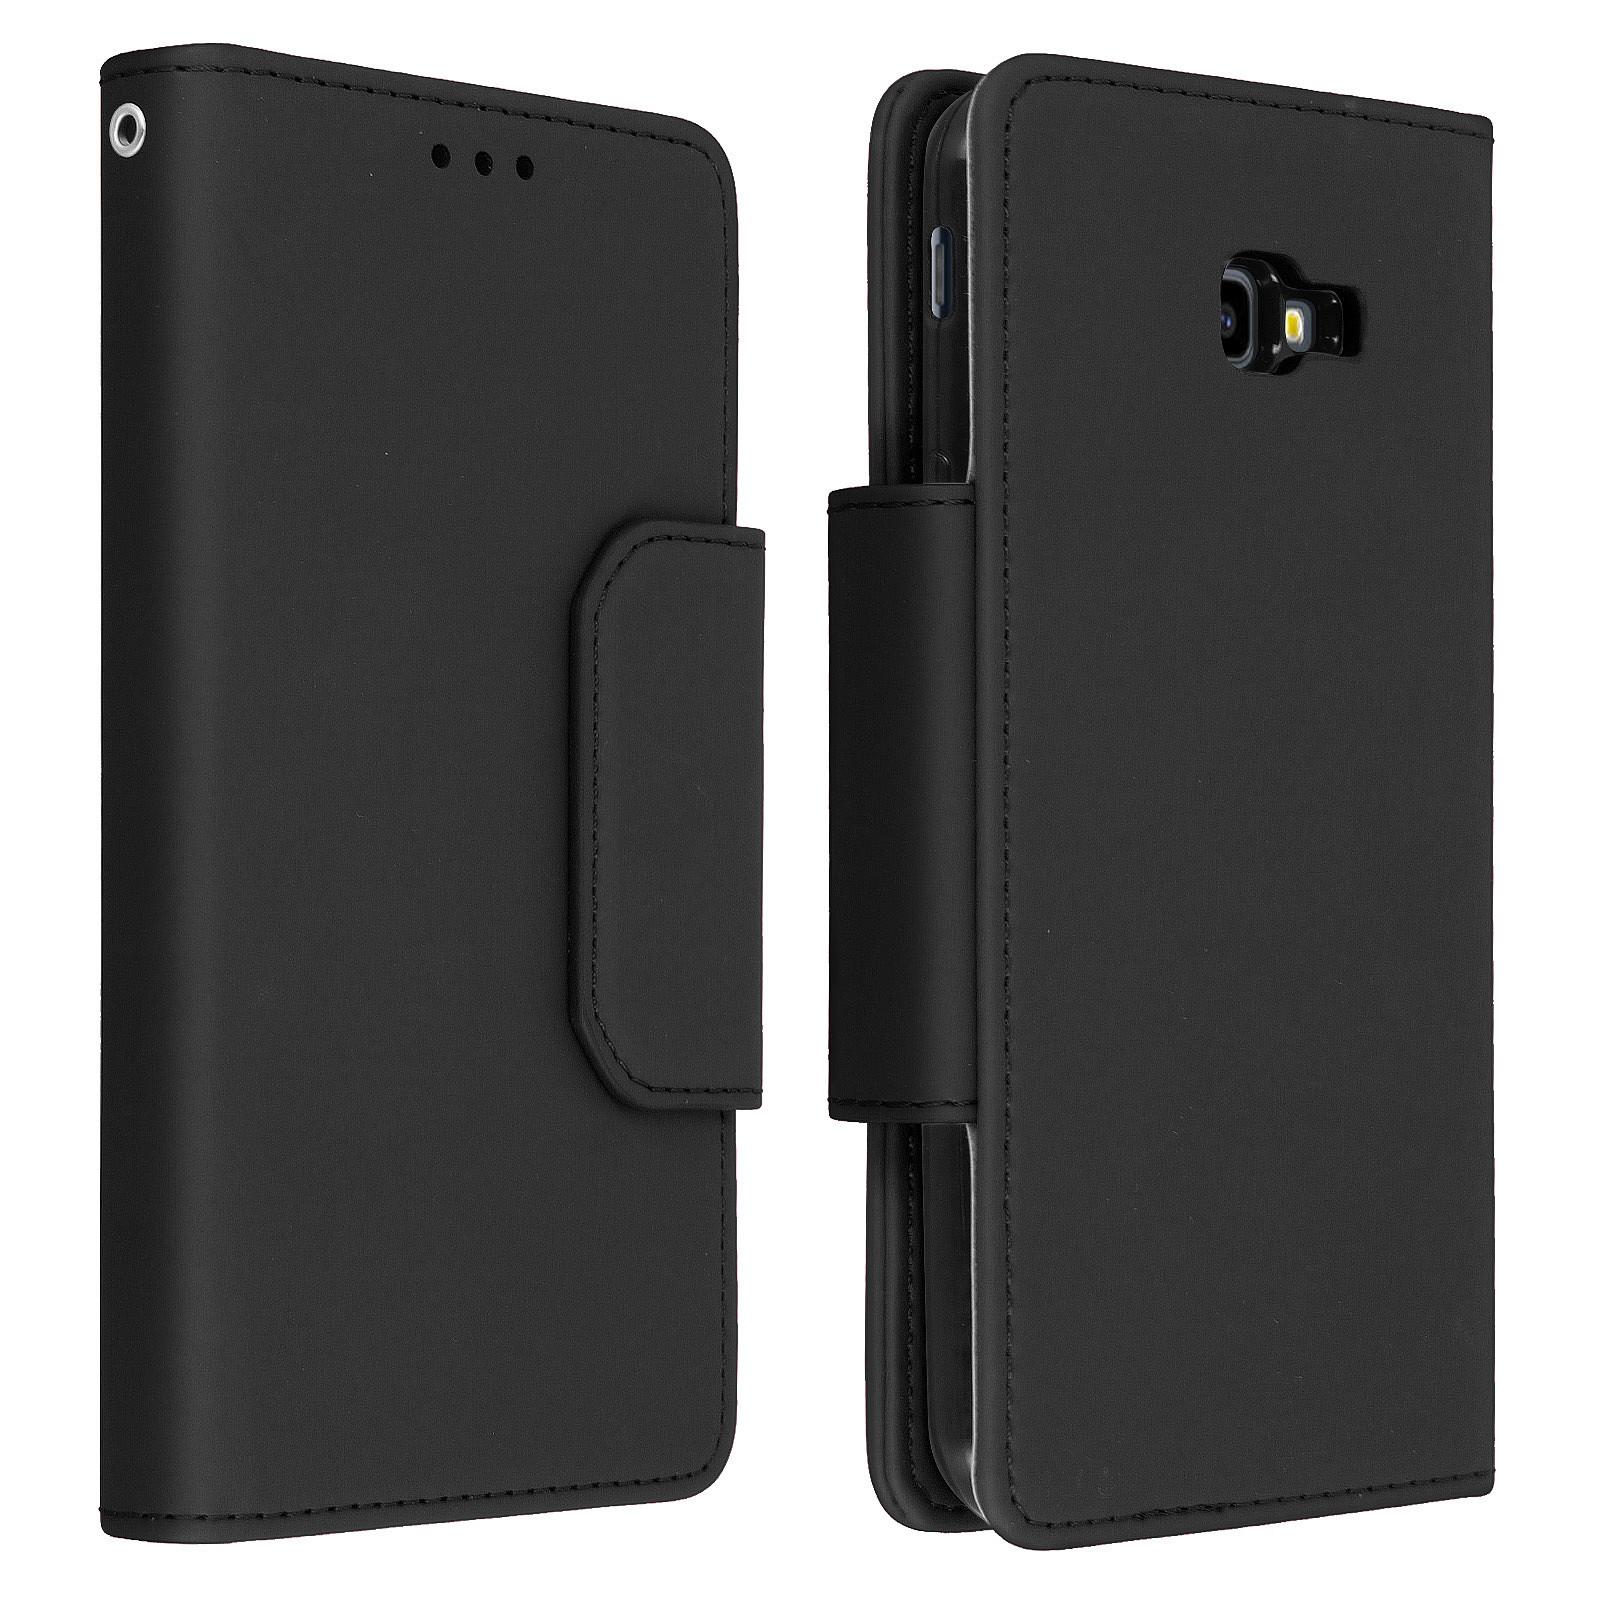 Avizar Etui folio Noir pour Samsung Galaxy J4 Plus